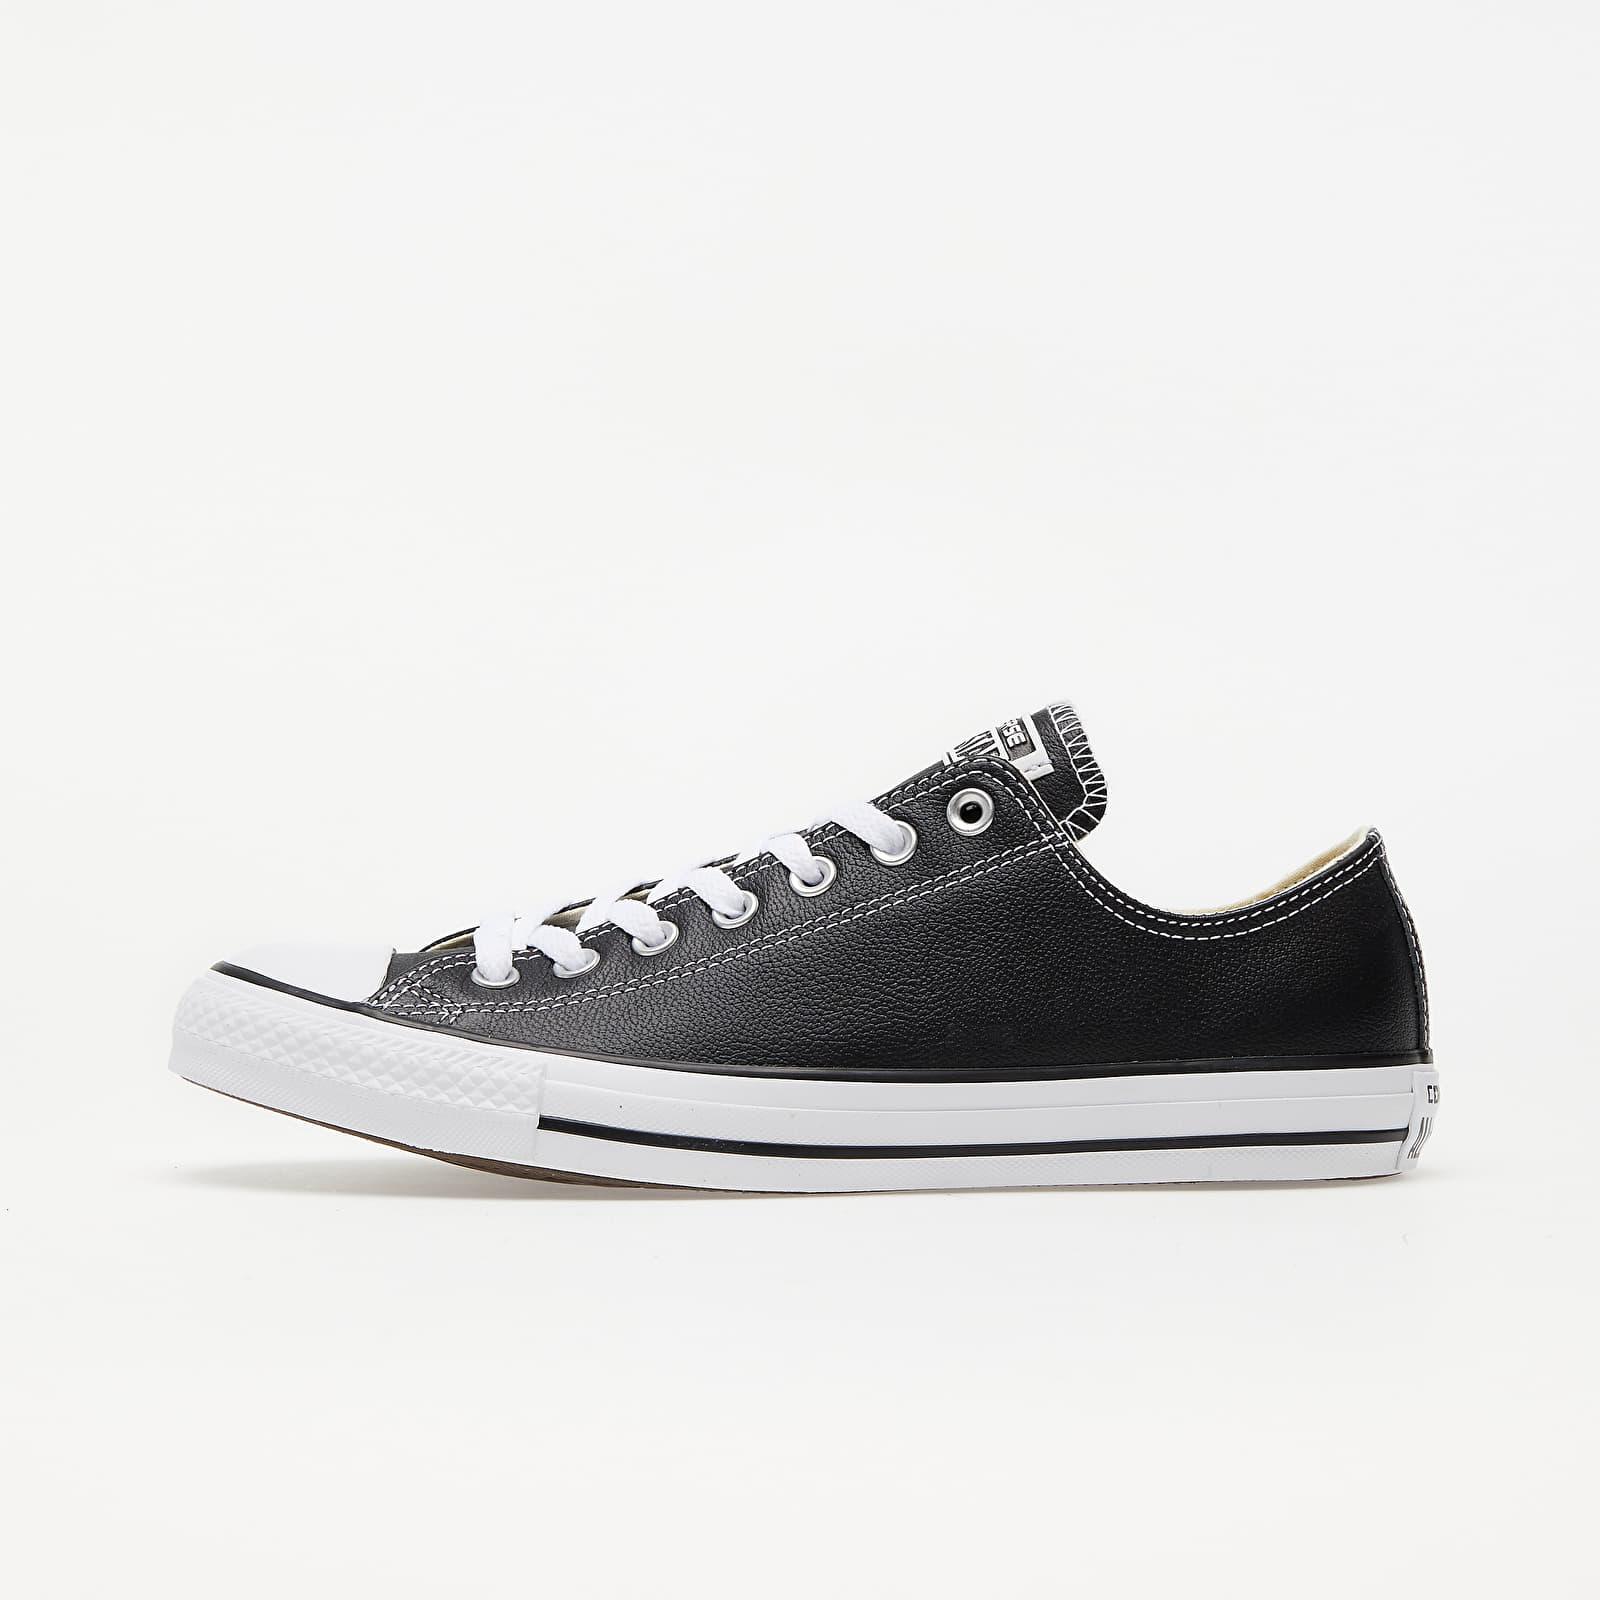 Дамски кецове и обувки Converse Chuck Taylor All Star OX Black